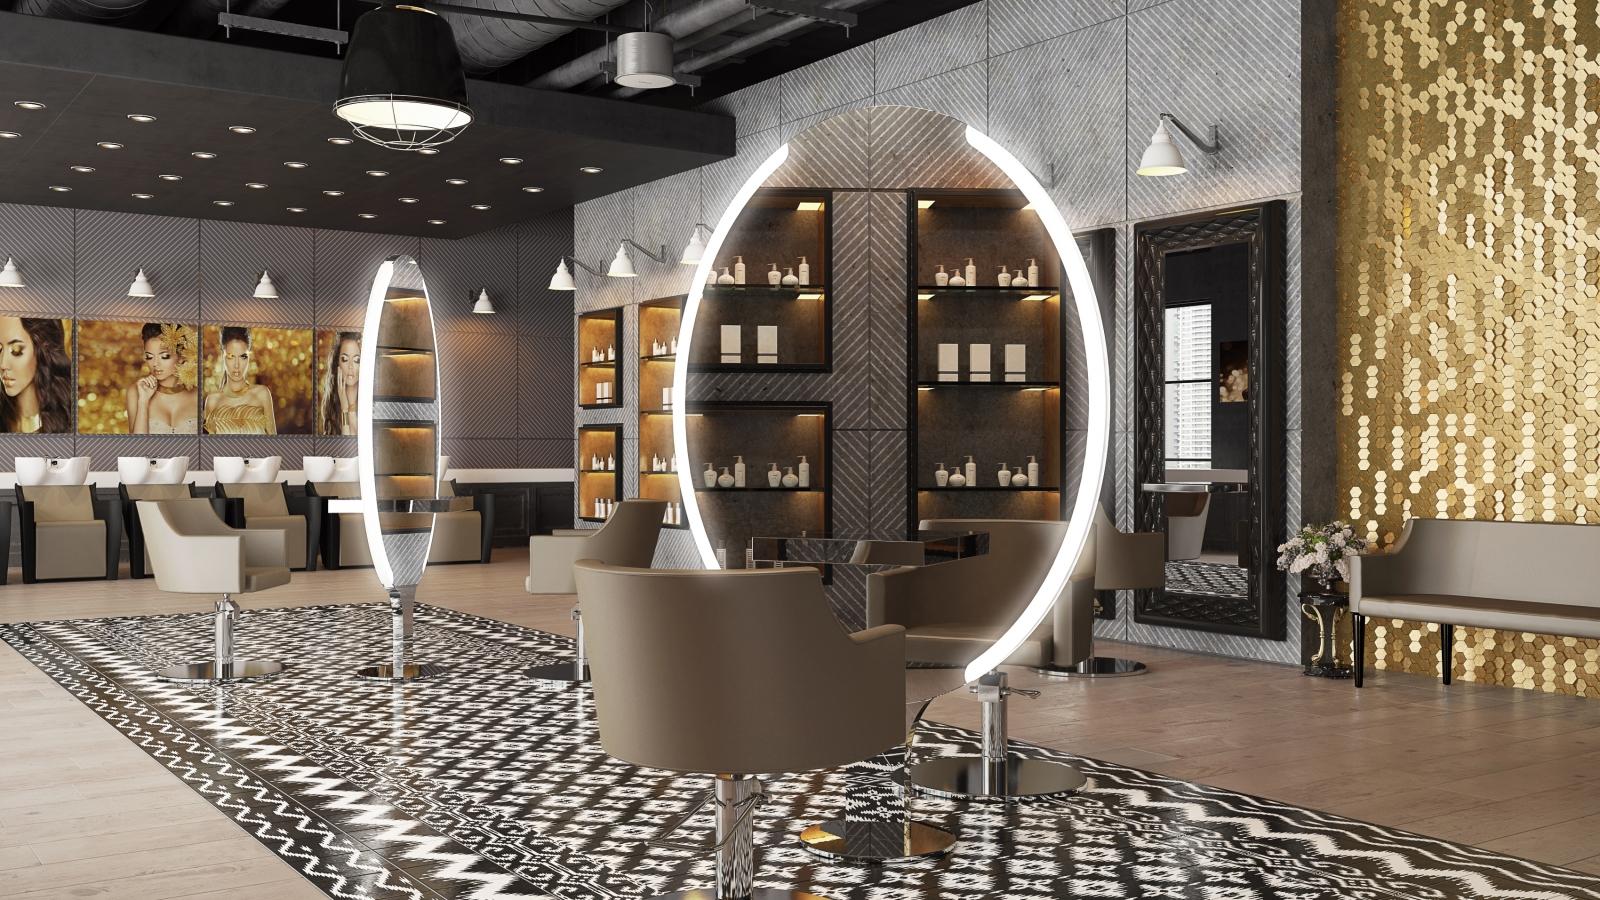 Besco arredamenti arredamento per parrucchieri ed estetica for Arredamento per parrucchieri